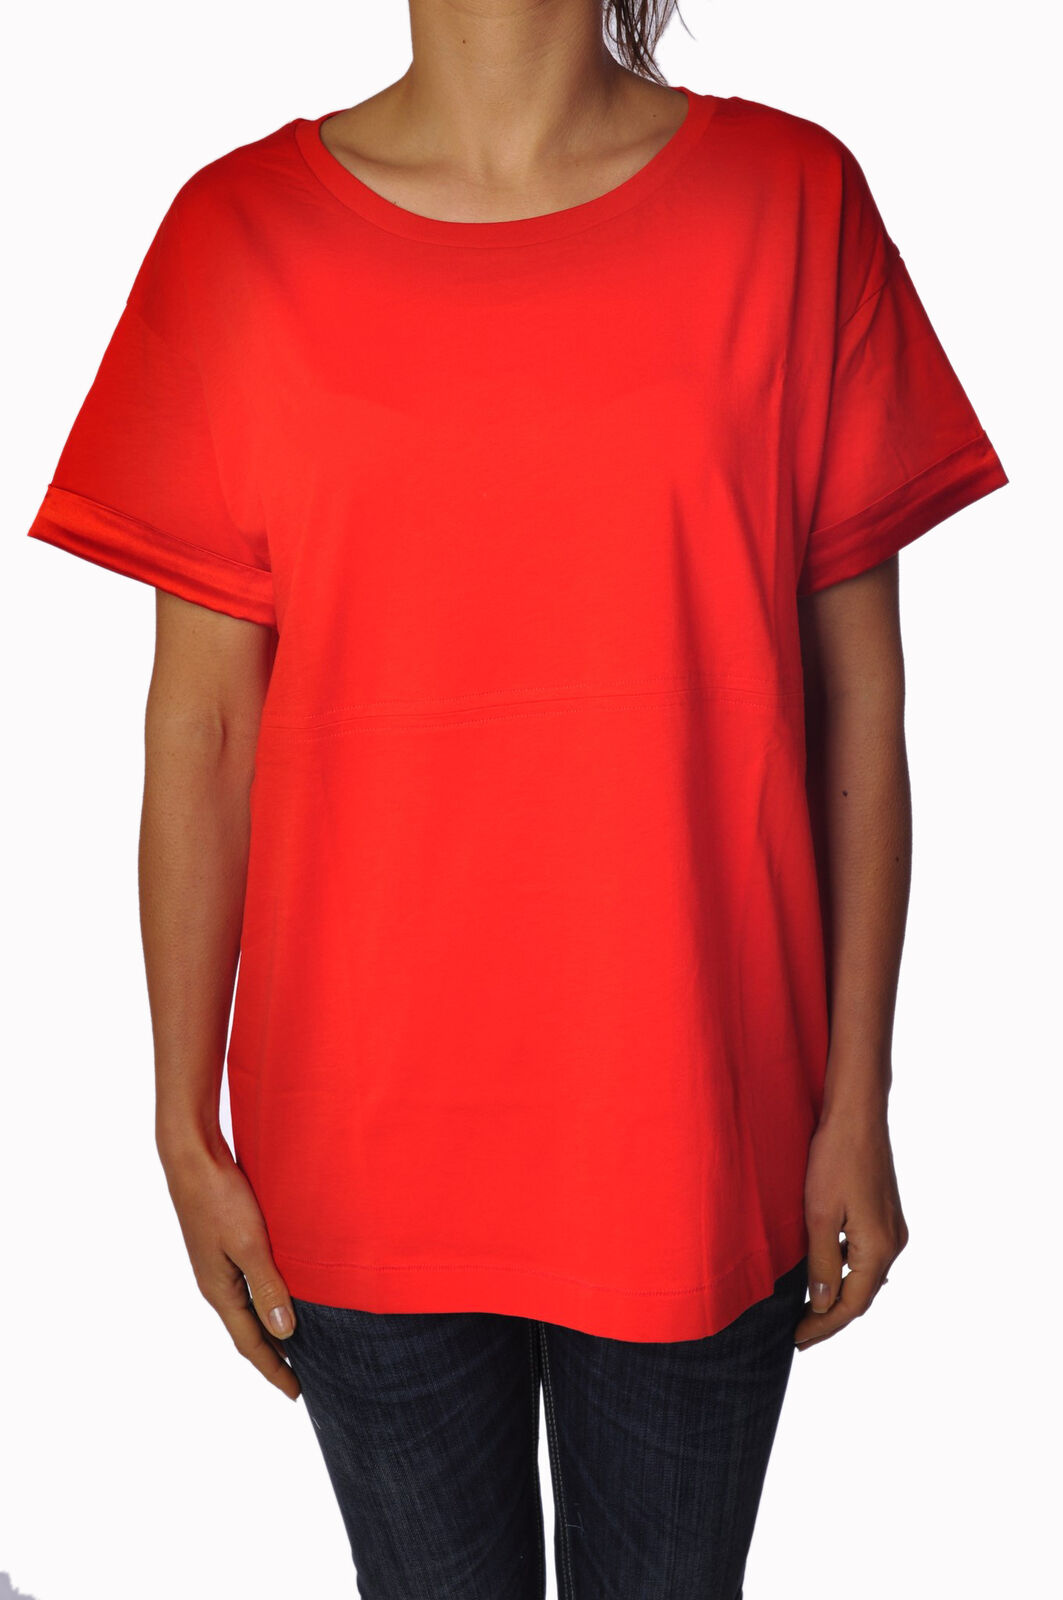 Rosao - Topwear-T-shirts - woman - rot - 783907E191451